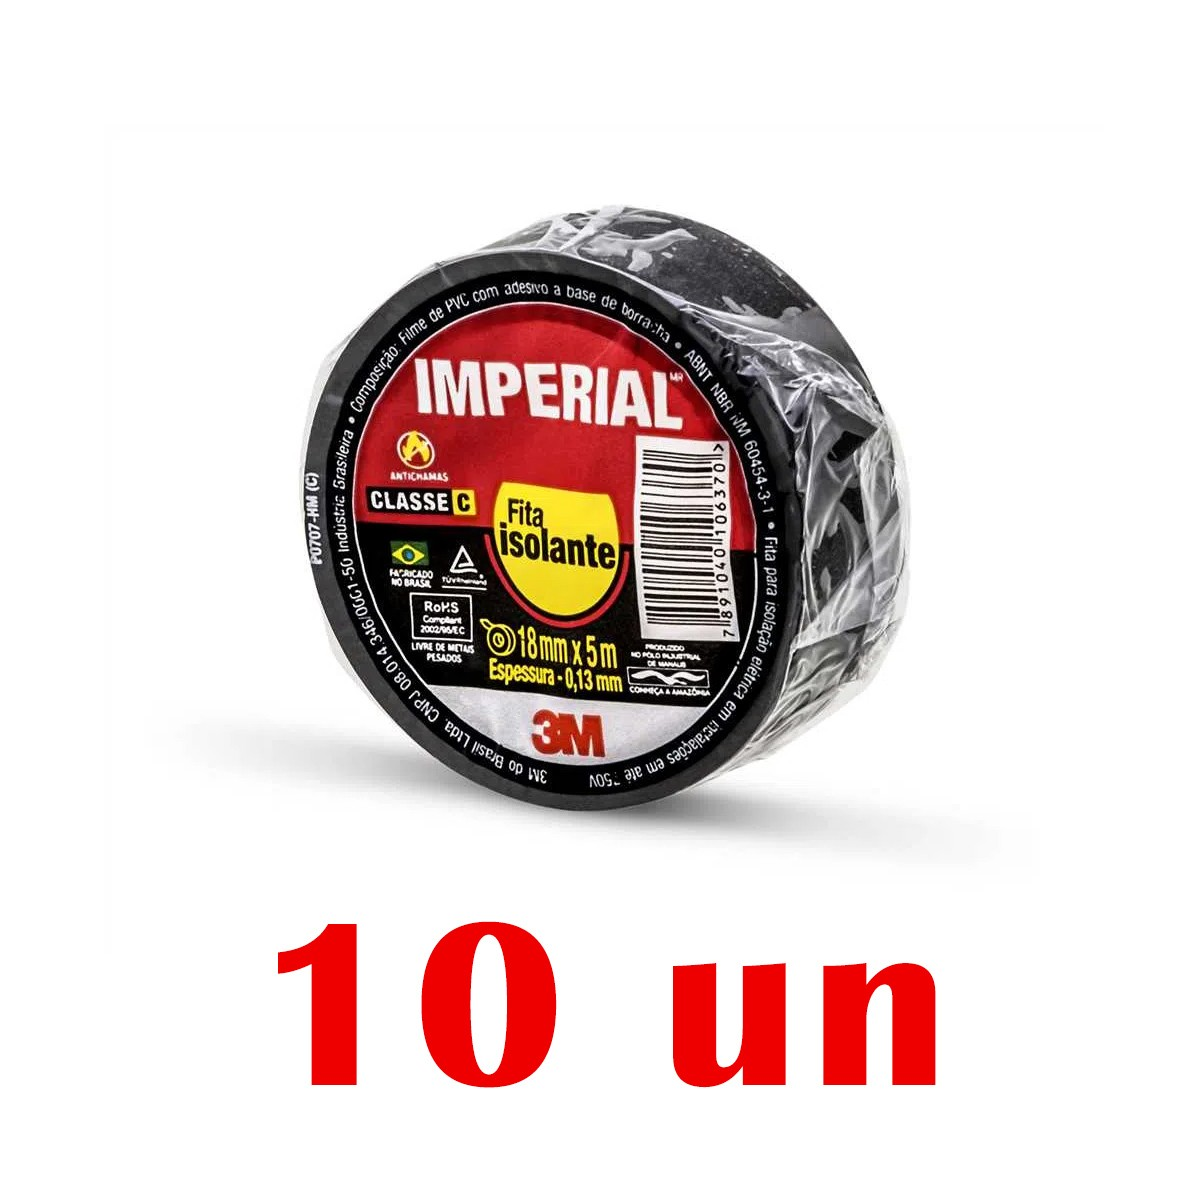 Kit 10 Pacotes de Fita Isolante 3M Imperial Preta Slim 18mmX5m